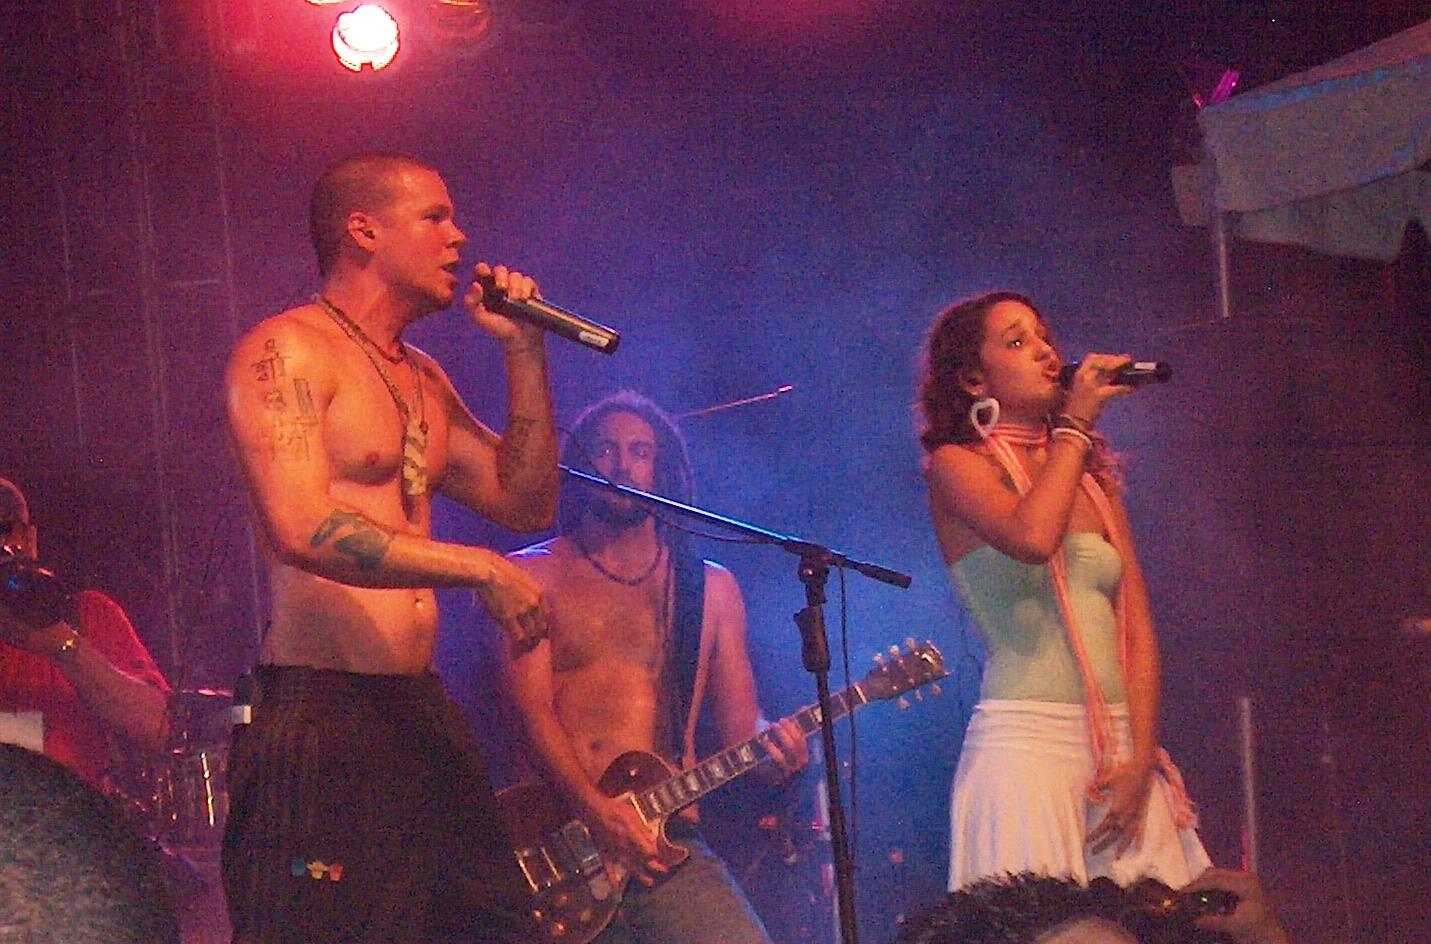 Ana Maria Rios Desnuda calle 13 (band) - wikiwand